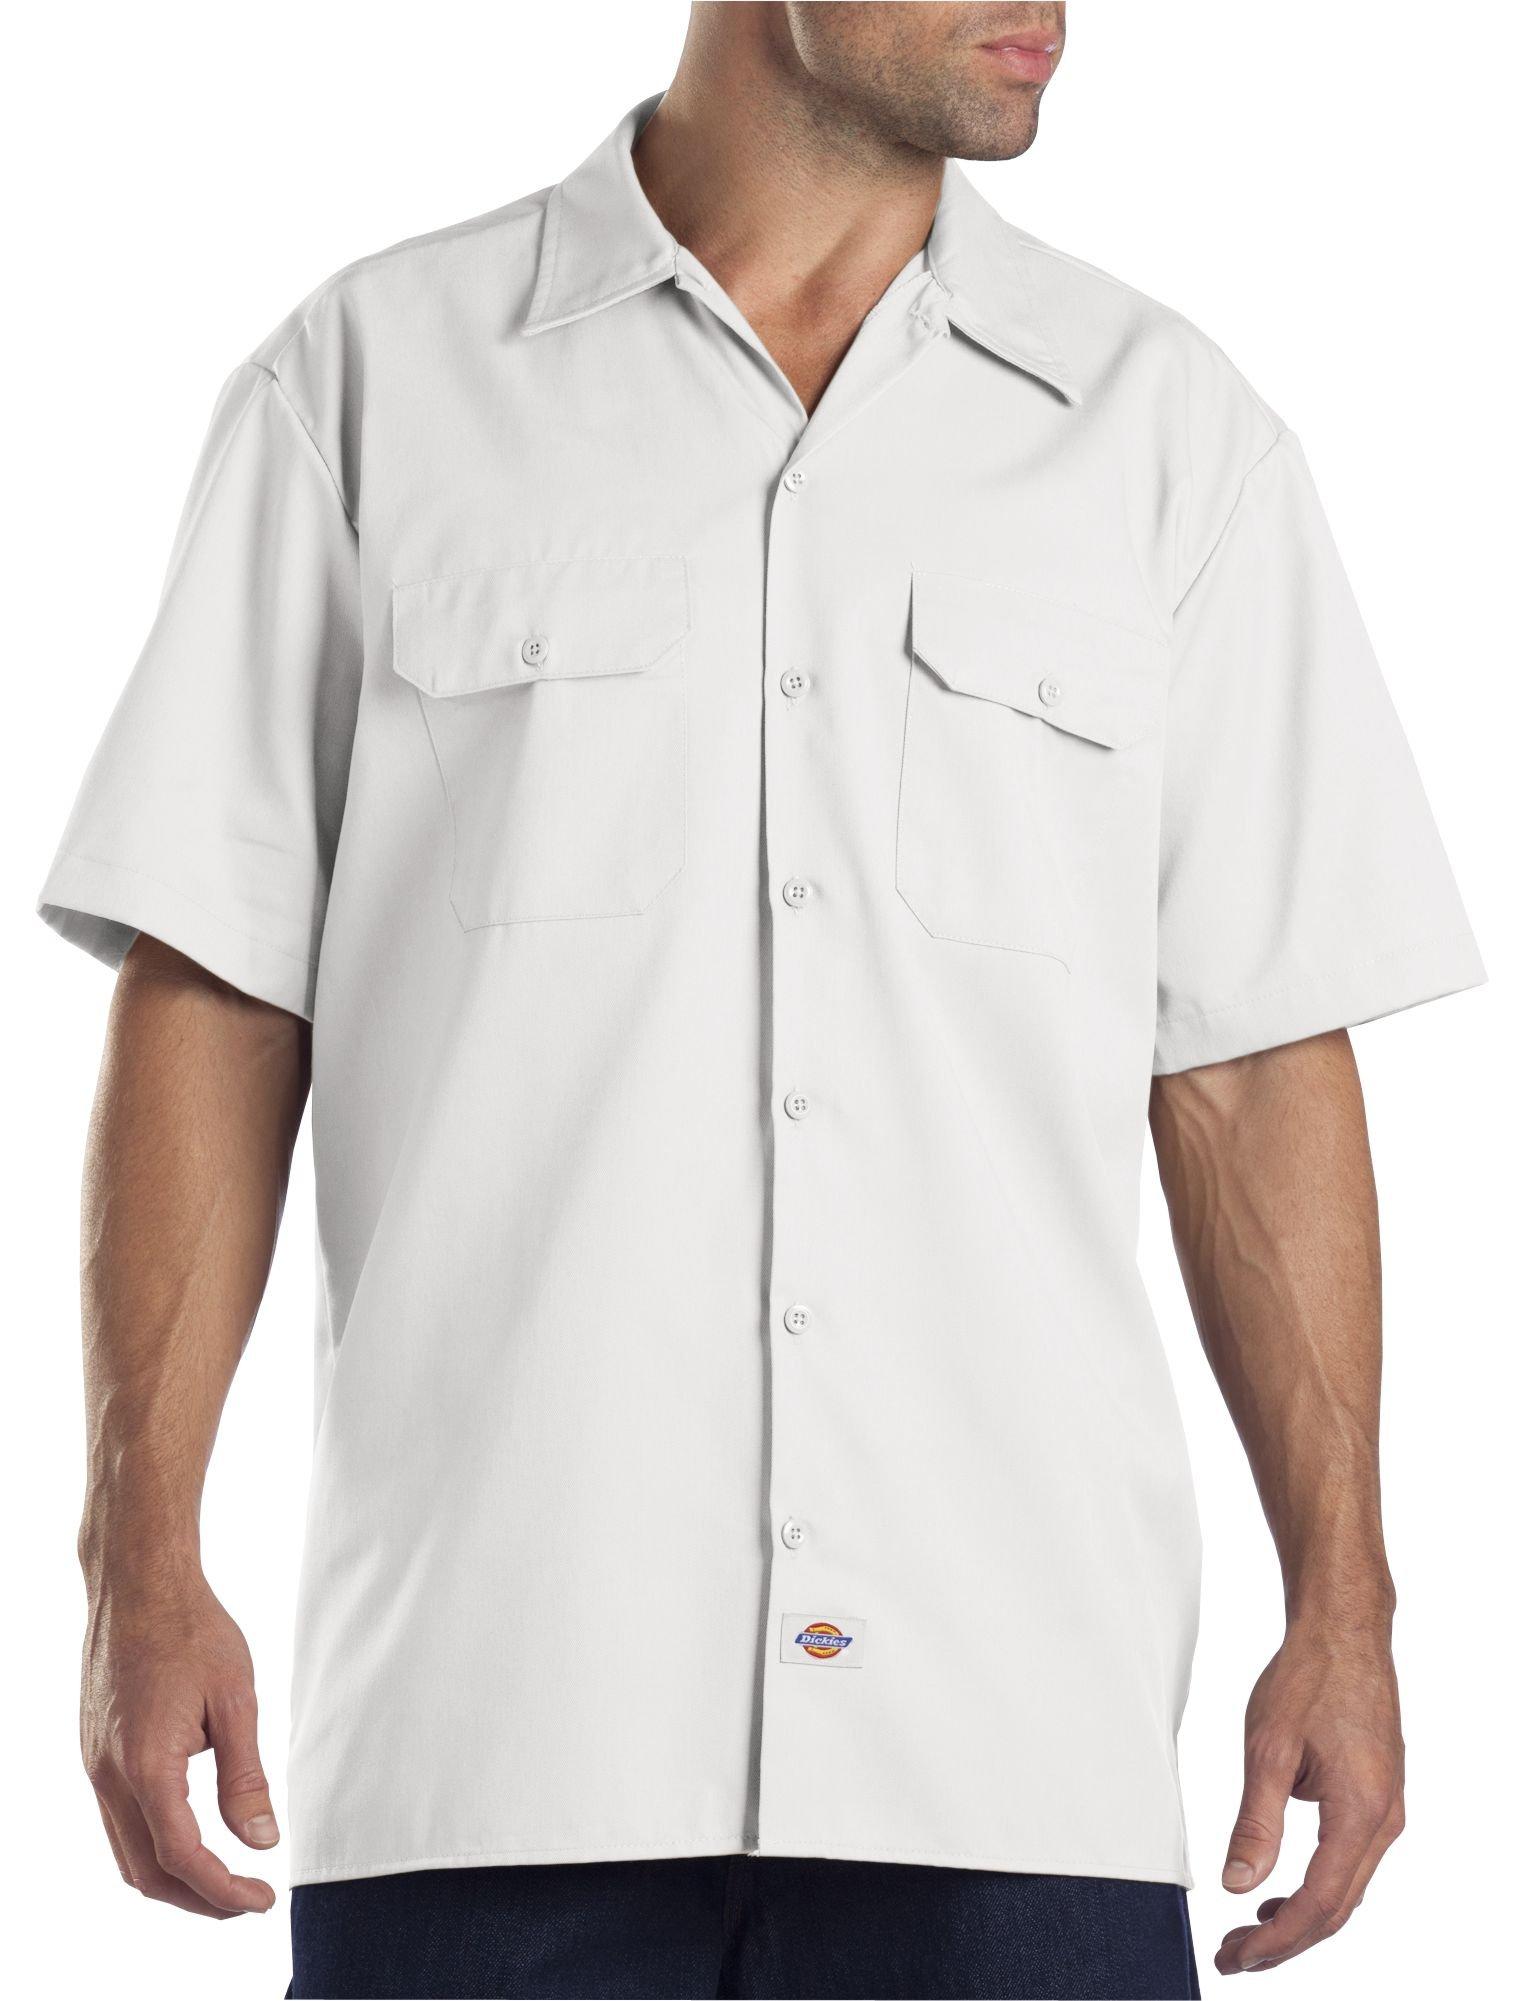 Dickies Men's Short-Sleeve Work Shirt, White, 2X-Large